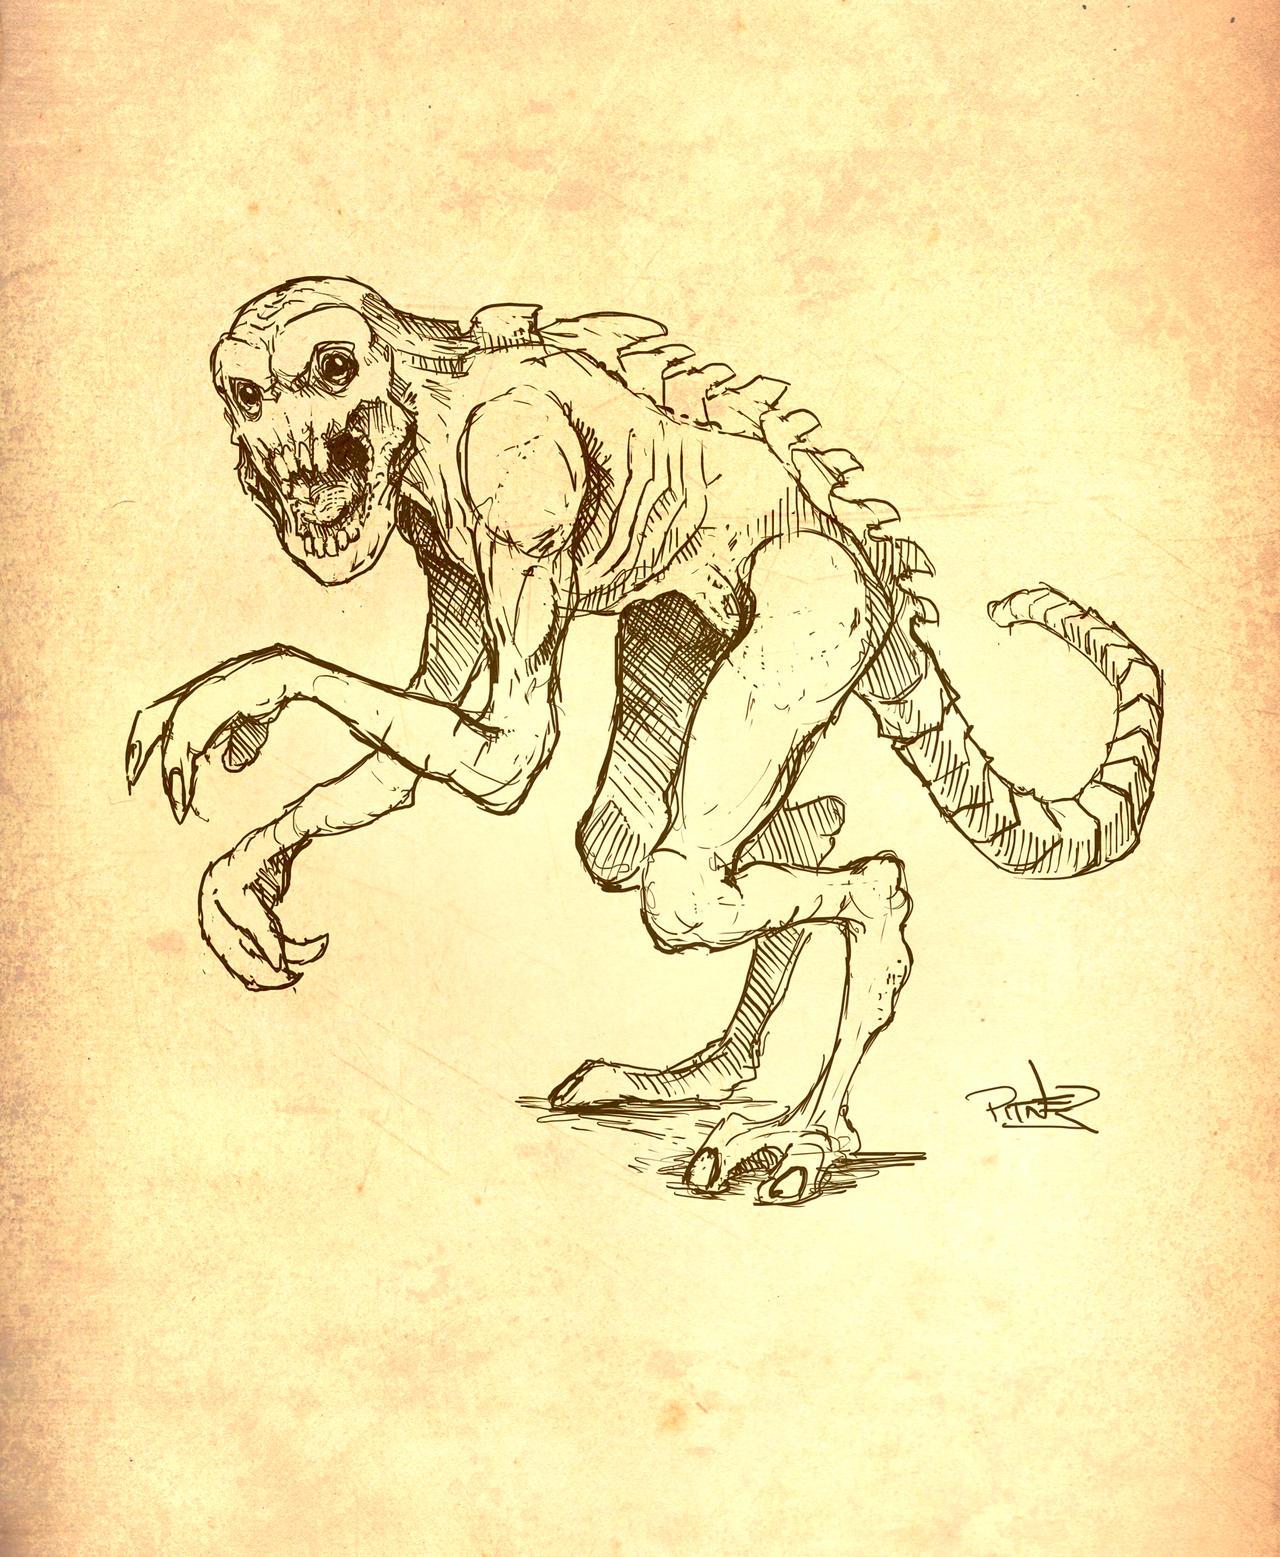 Ratfiend thing sketch by pitnerd